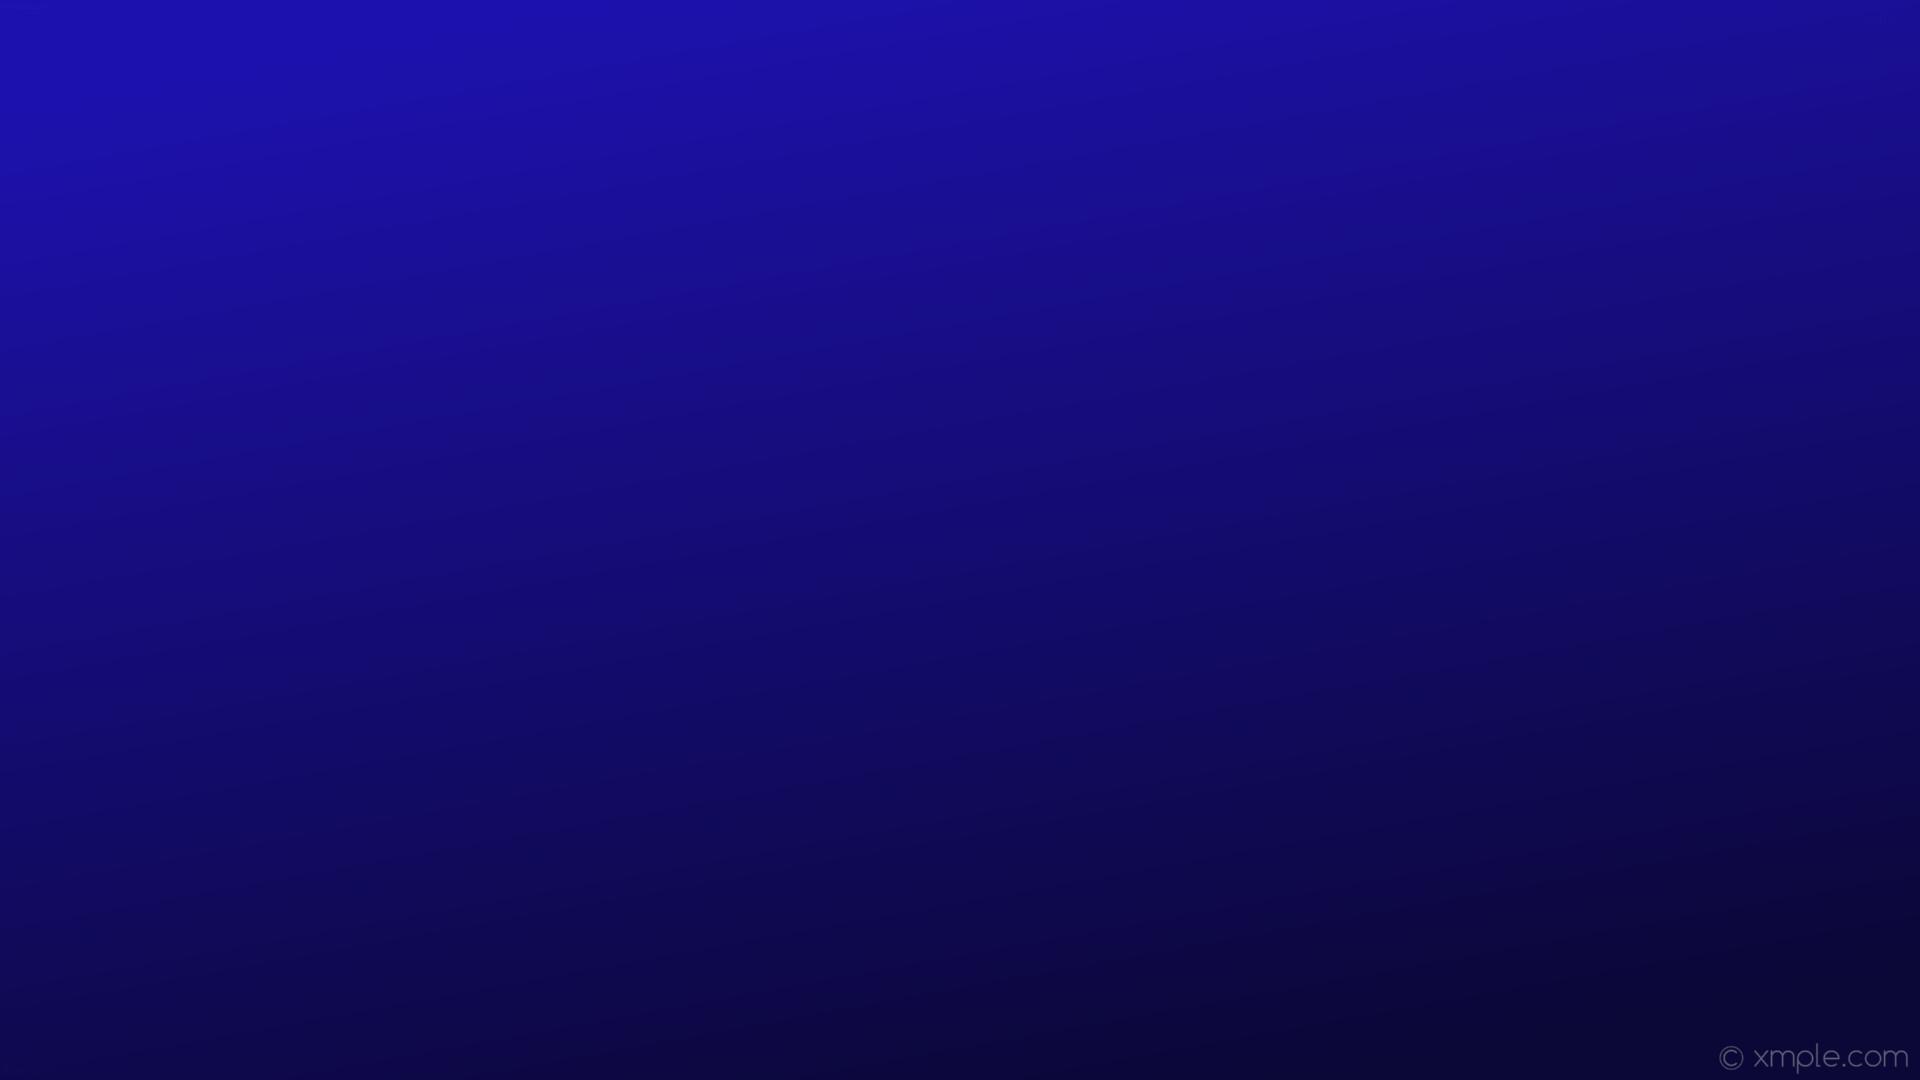 wallpaper linear blue gradient dark blue #1d11ad #0b0737 120°